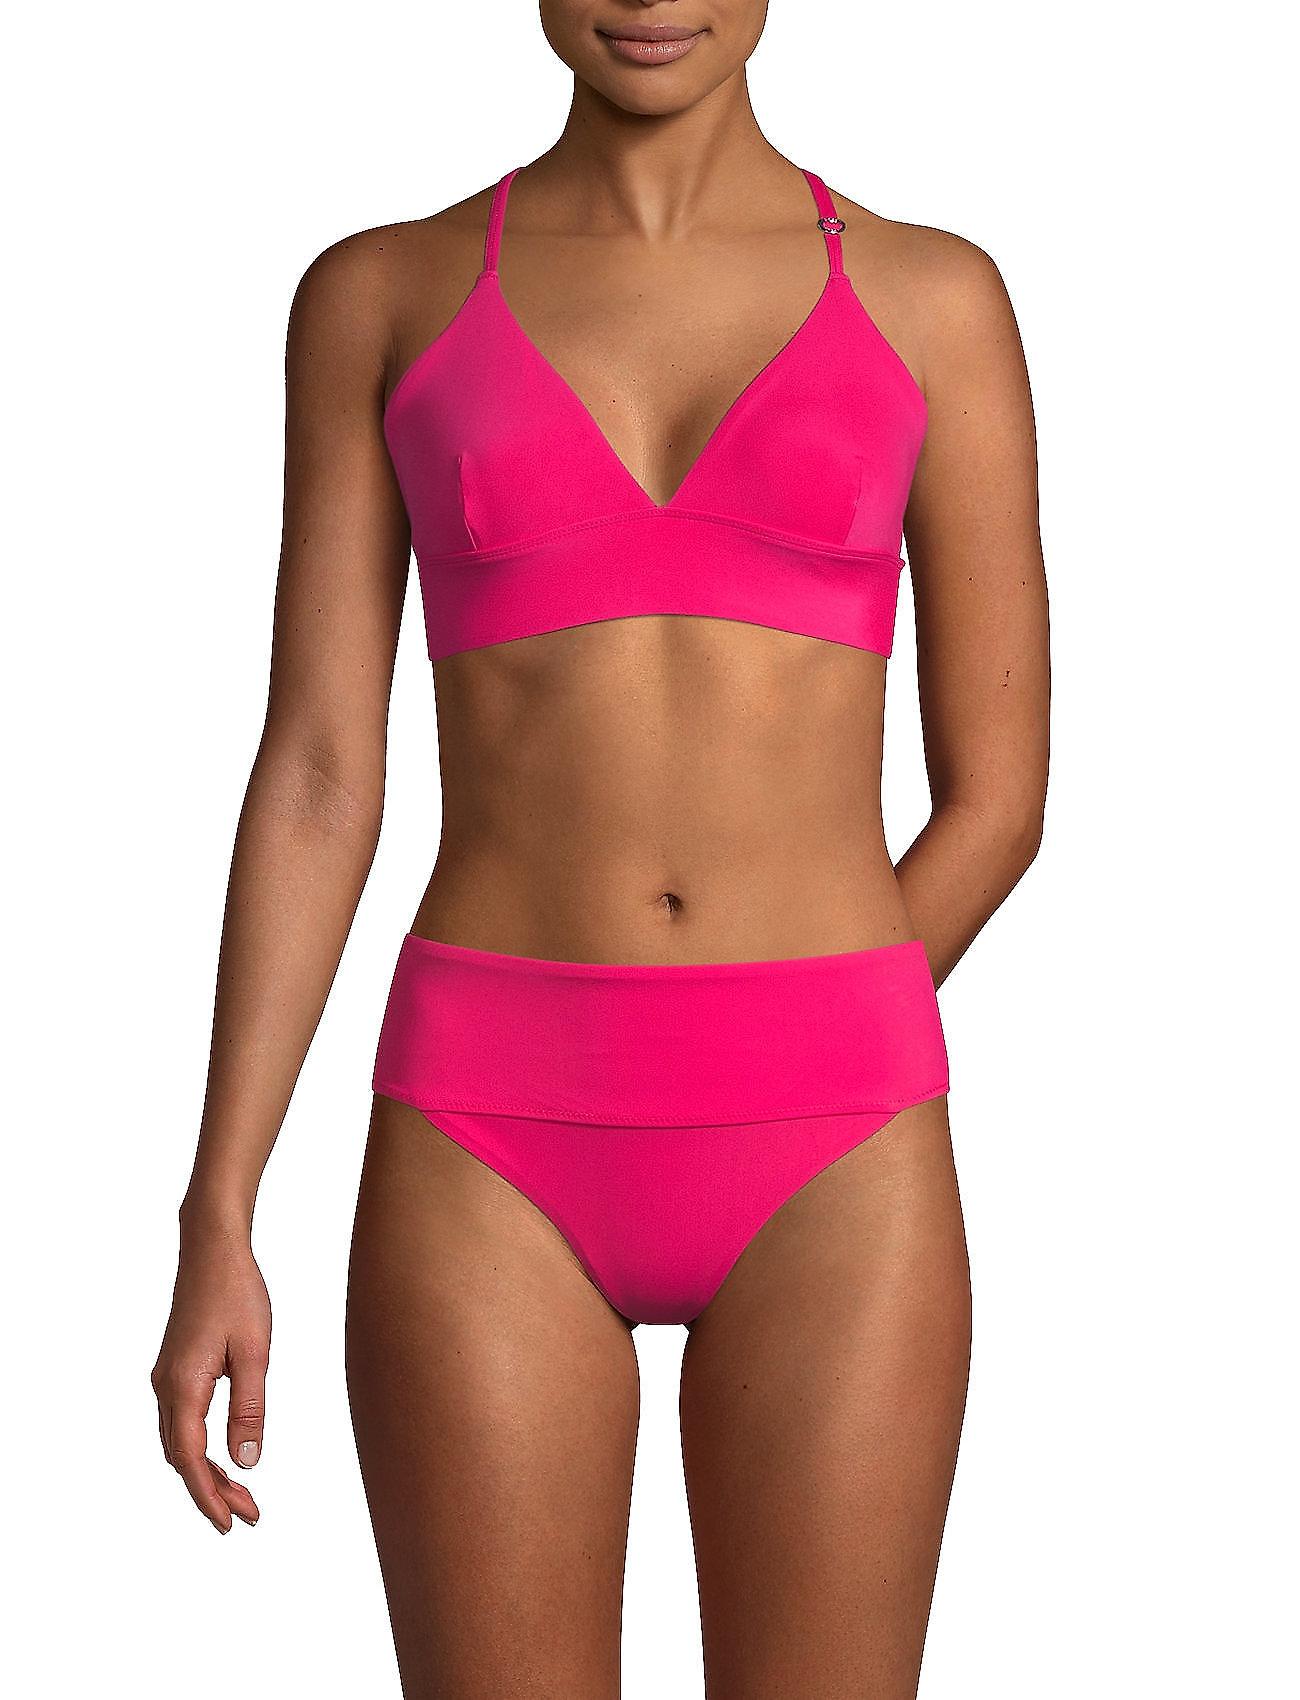 Casall - Iconic Bikini Top - bikinitoppar - lt vivid pink - 0